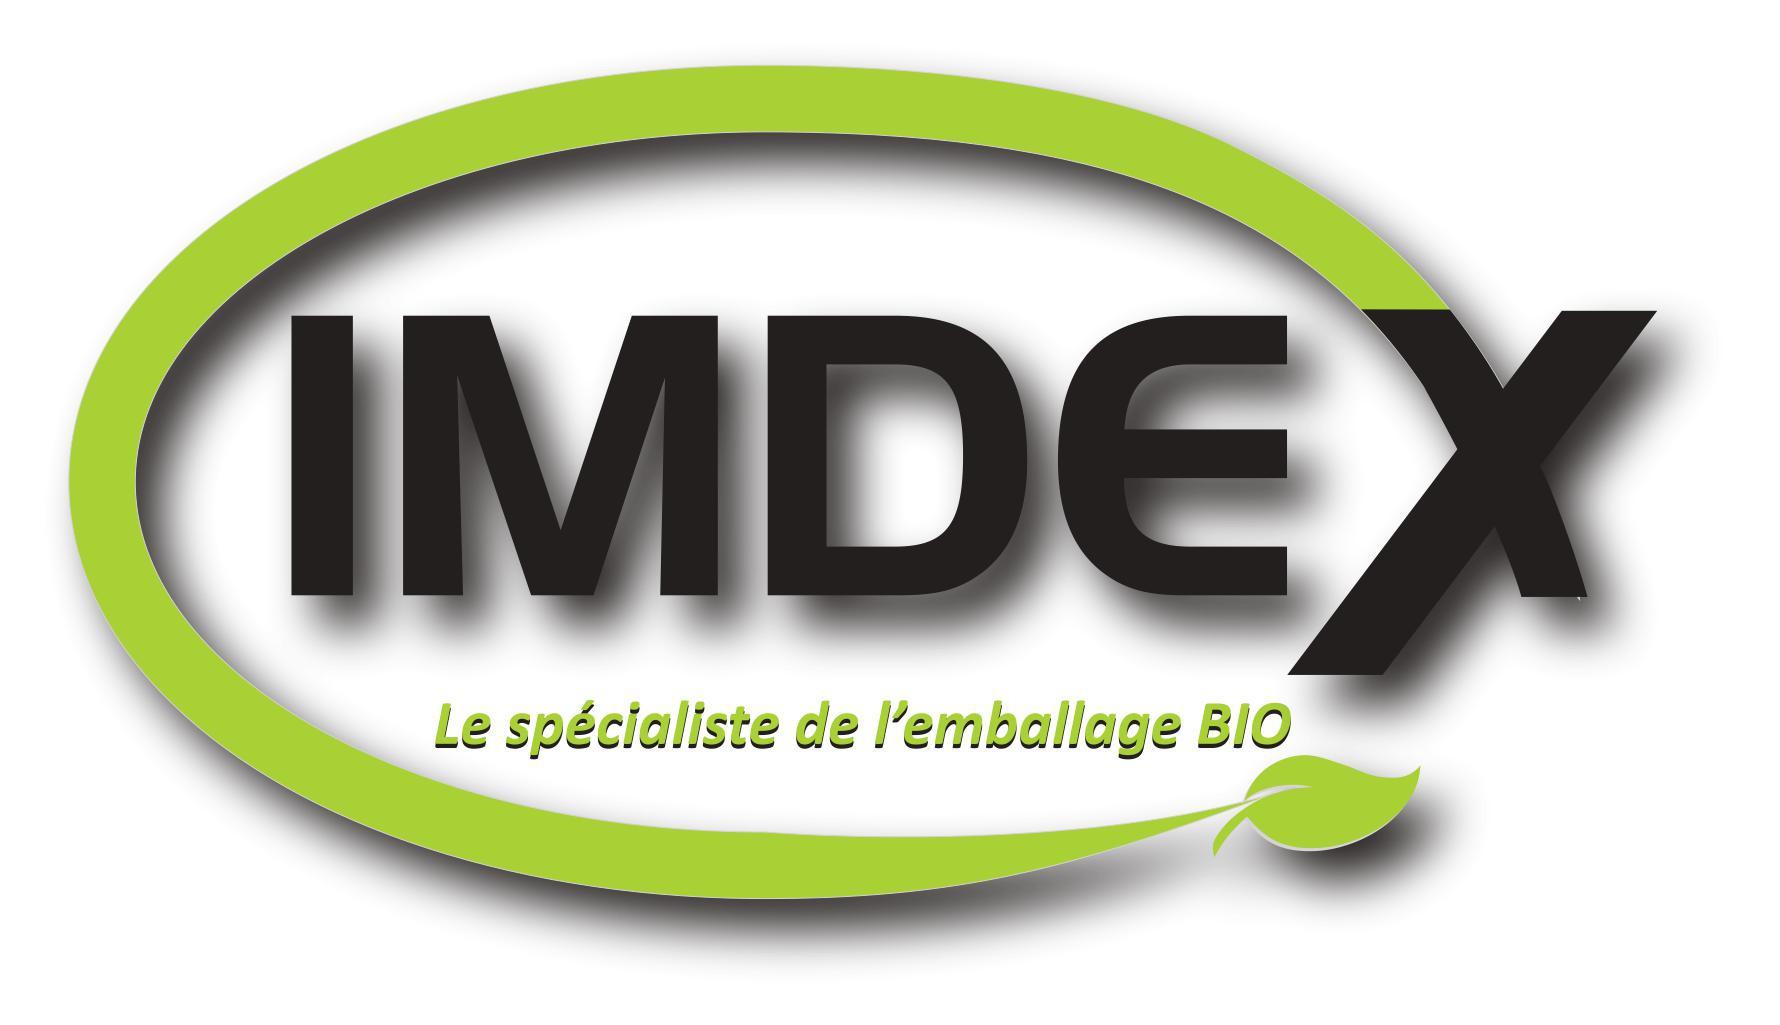 IMDEX Le Specialiste de L Emballage